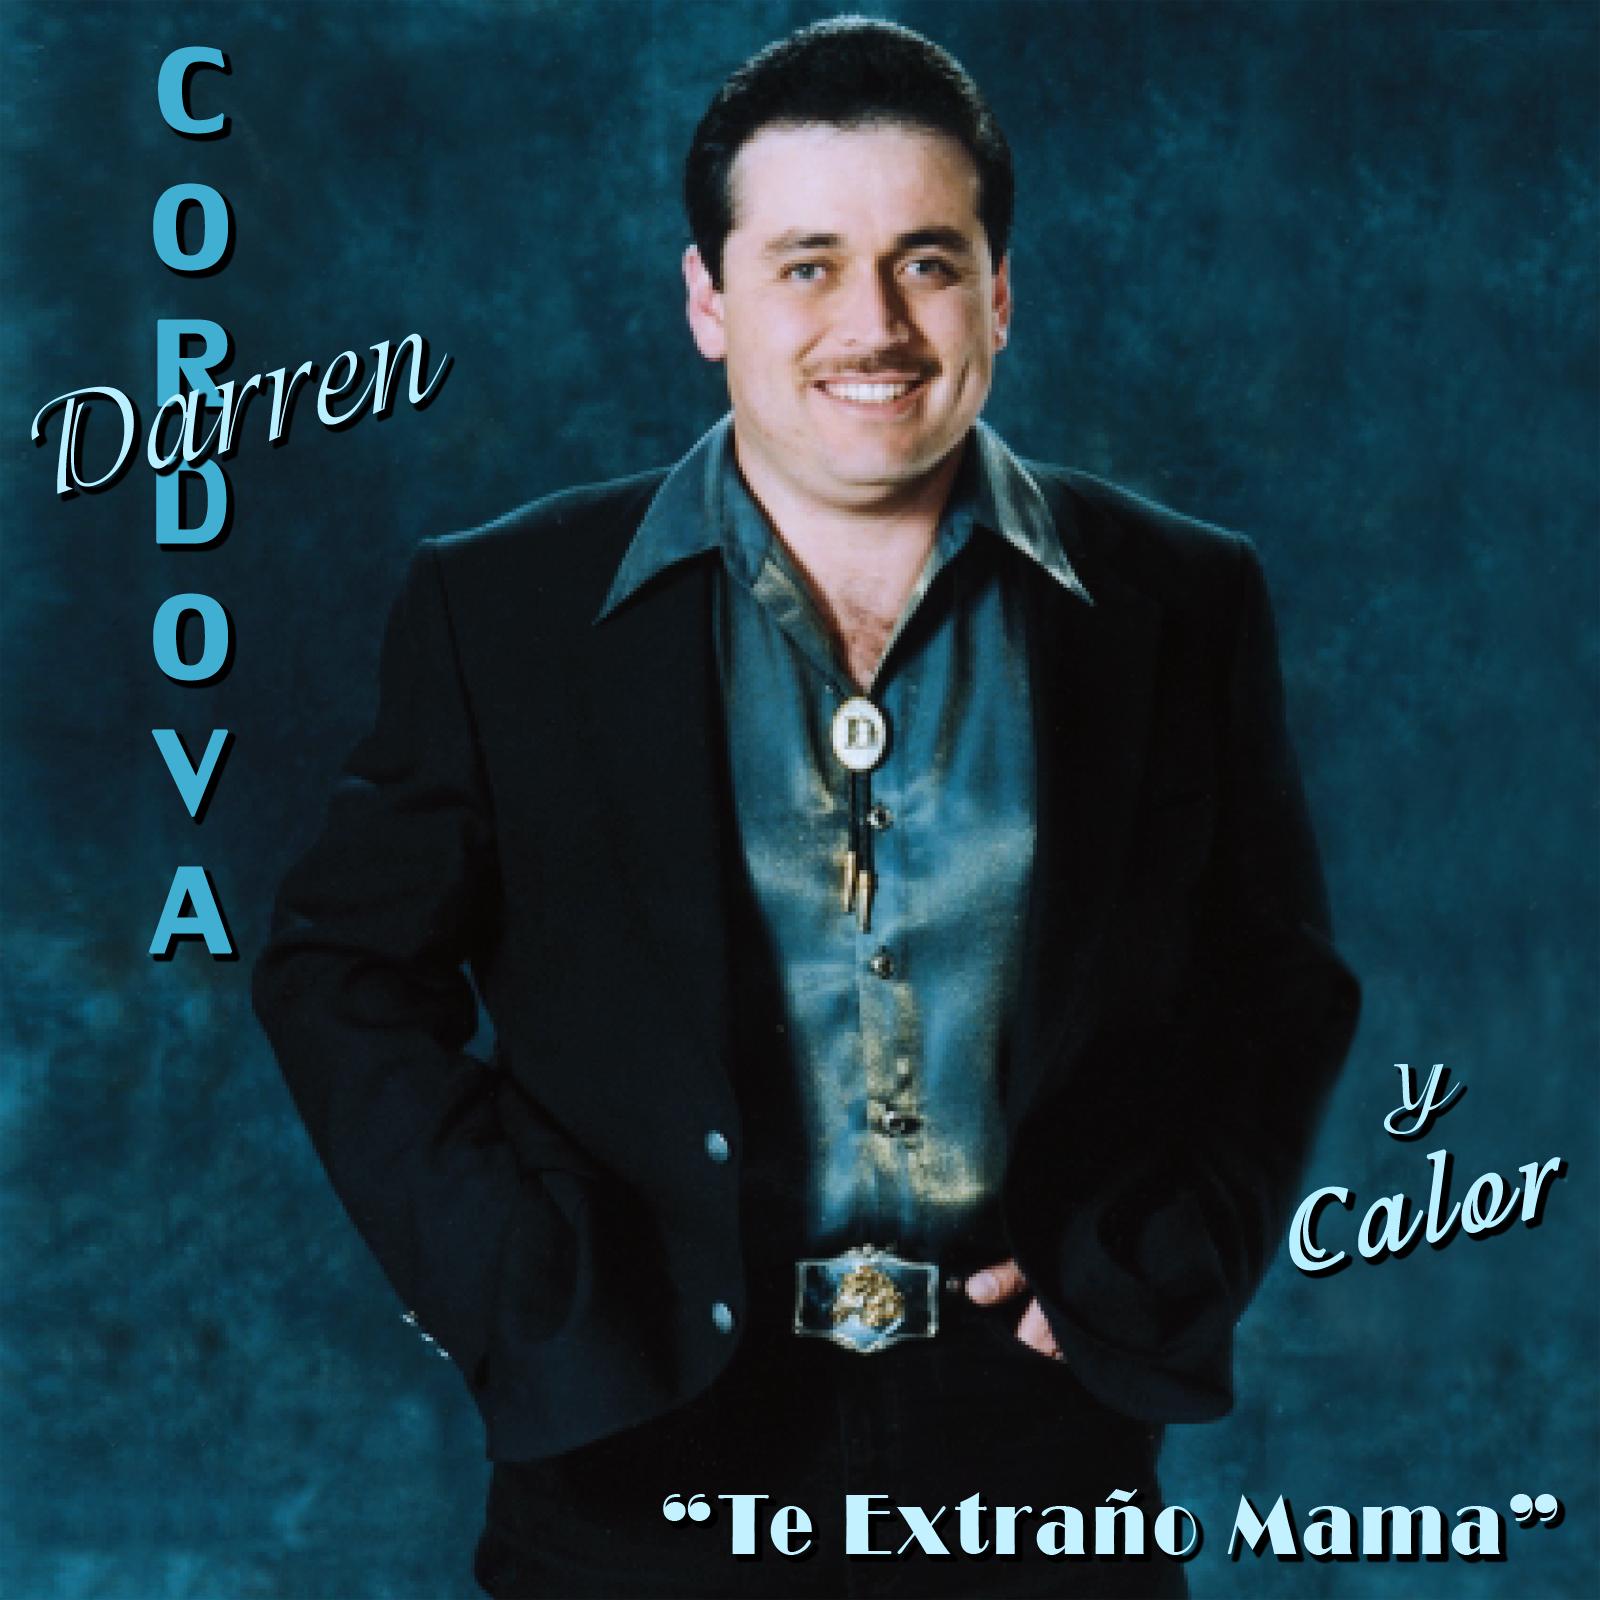 Play & Download Te Extraño Mama by Darren Cordova Y Calor | Napster